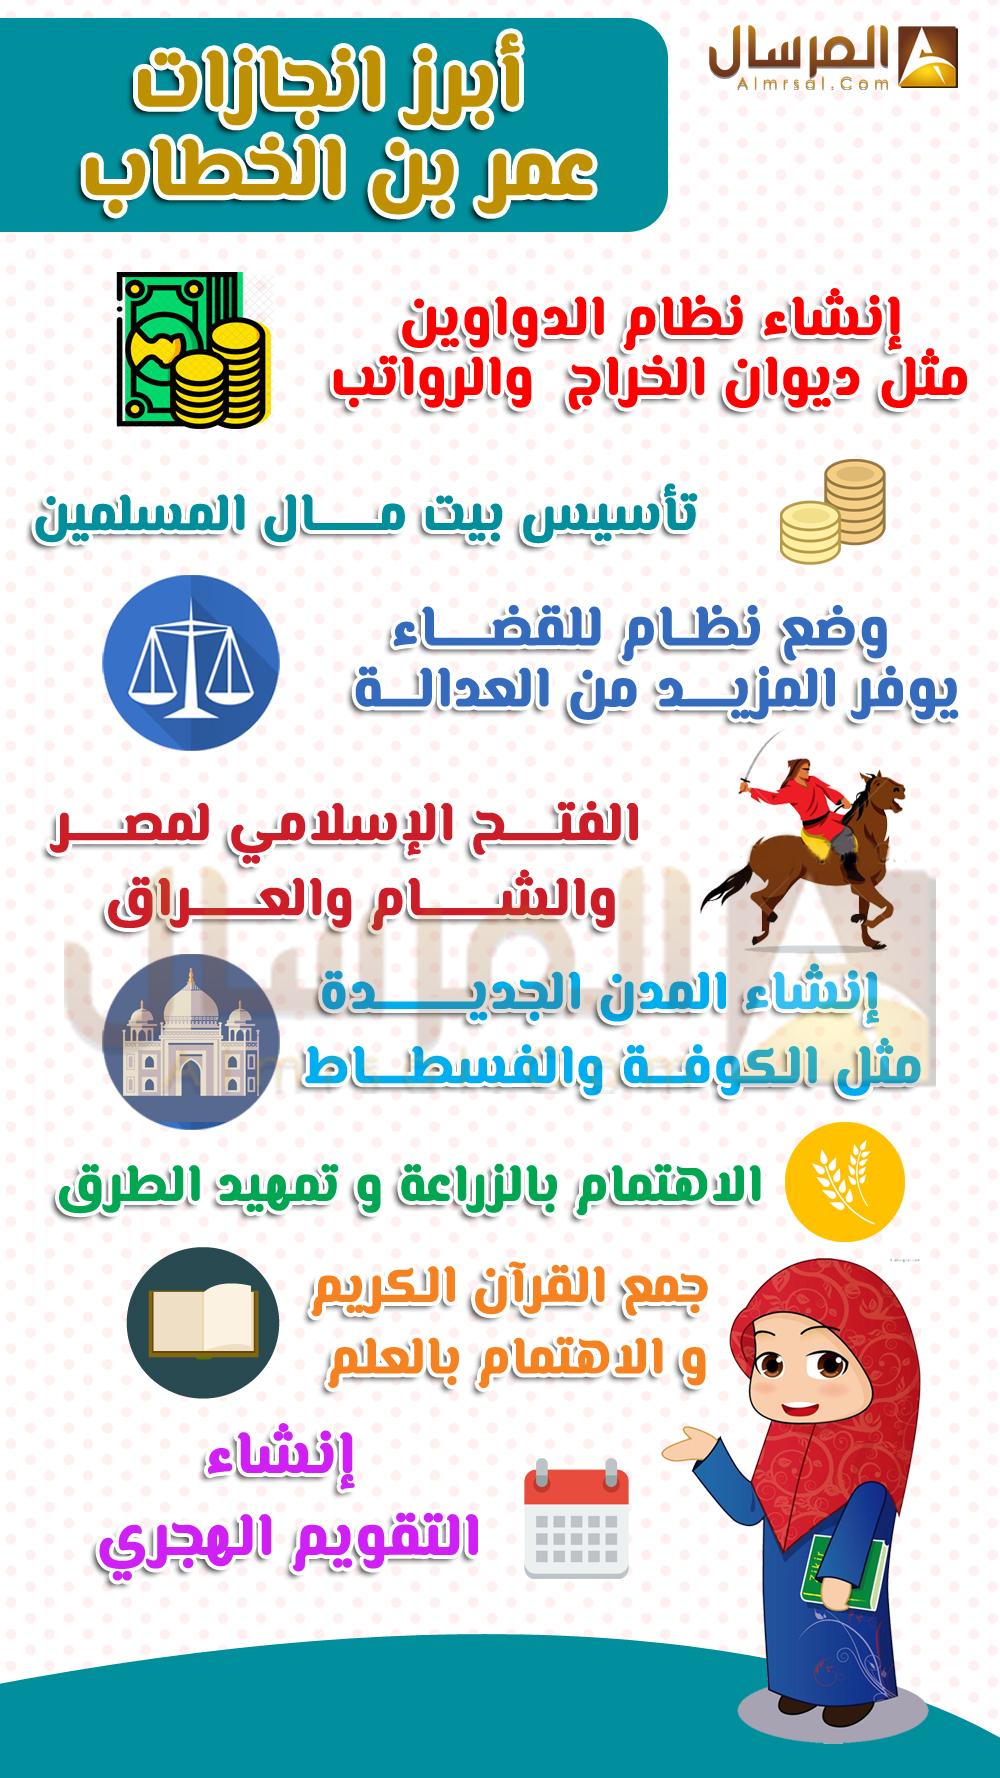 achievements of omar bin al - khattab may allah be pleased with him Achievements of Omar bin al – Khattab may Allah be pleased with him  D8 A7 D9 86 D8 AC D8 A7 D8 B2 D8 A7 D8 AA  D8 B9 D9 85 D8 B1  D8 A8 D9 86  D8 A7 D9 84 D8 AE D8 B7 D8 A7 D8 A8